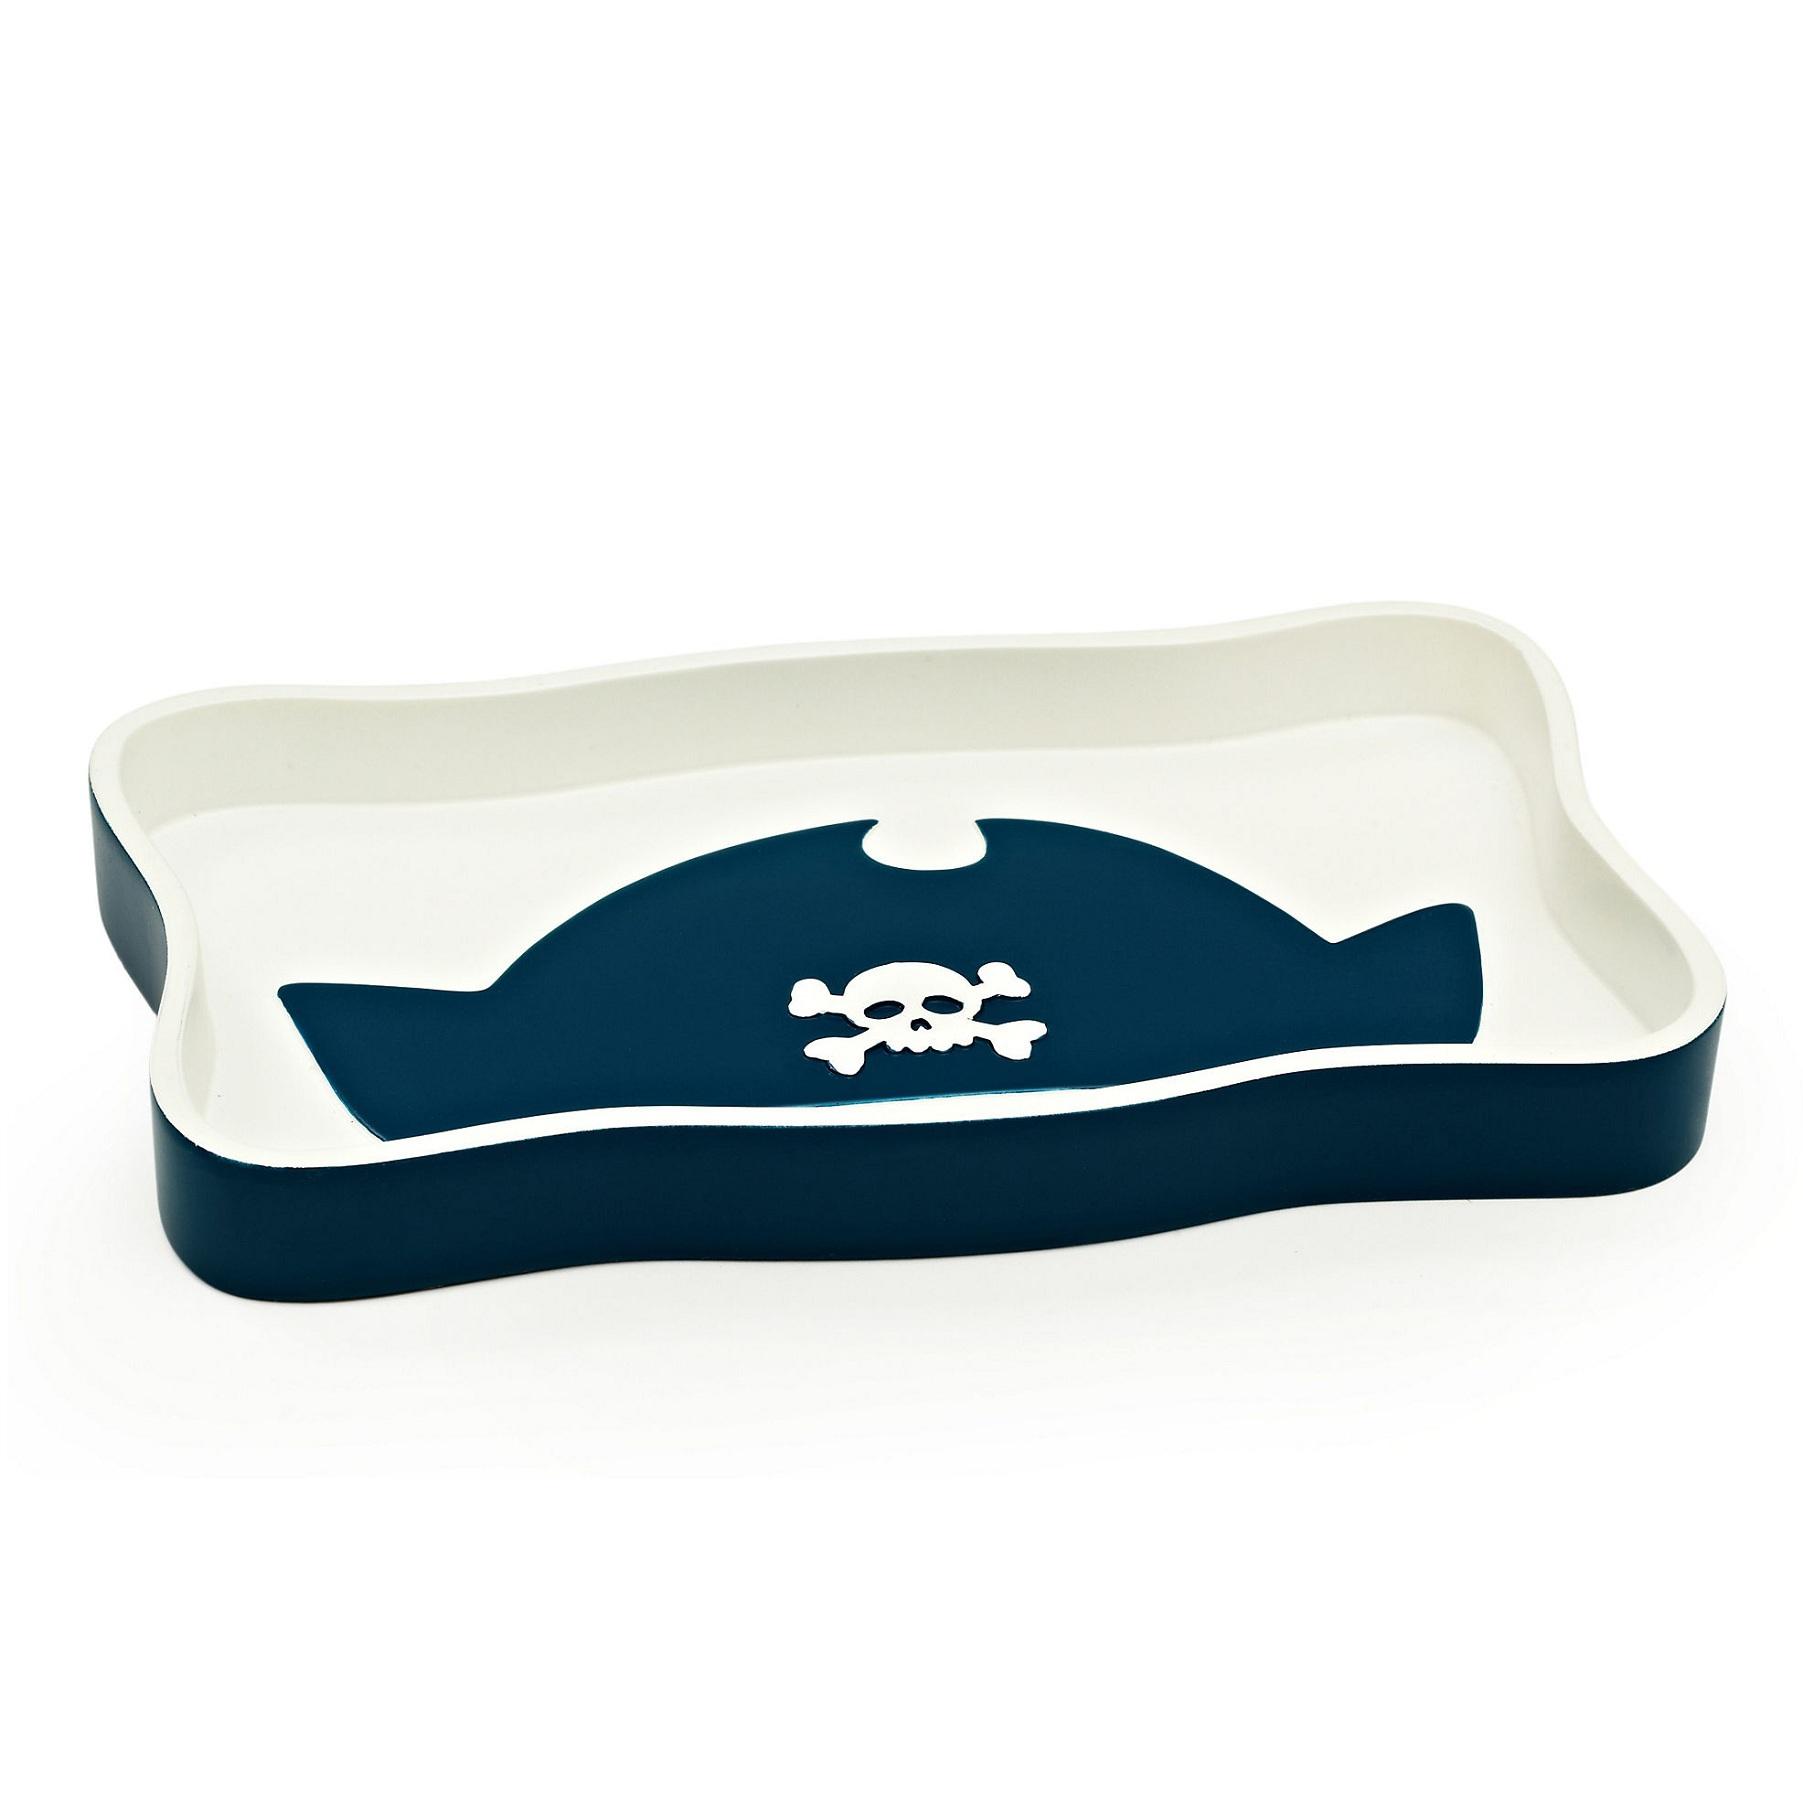 Для ванной Подставка для предметов детская Kassatex Pirates podstavka-dlya-predmetov-kassatex-pirates-ssha-kitay.jpg